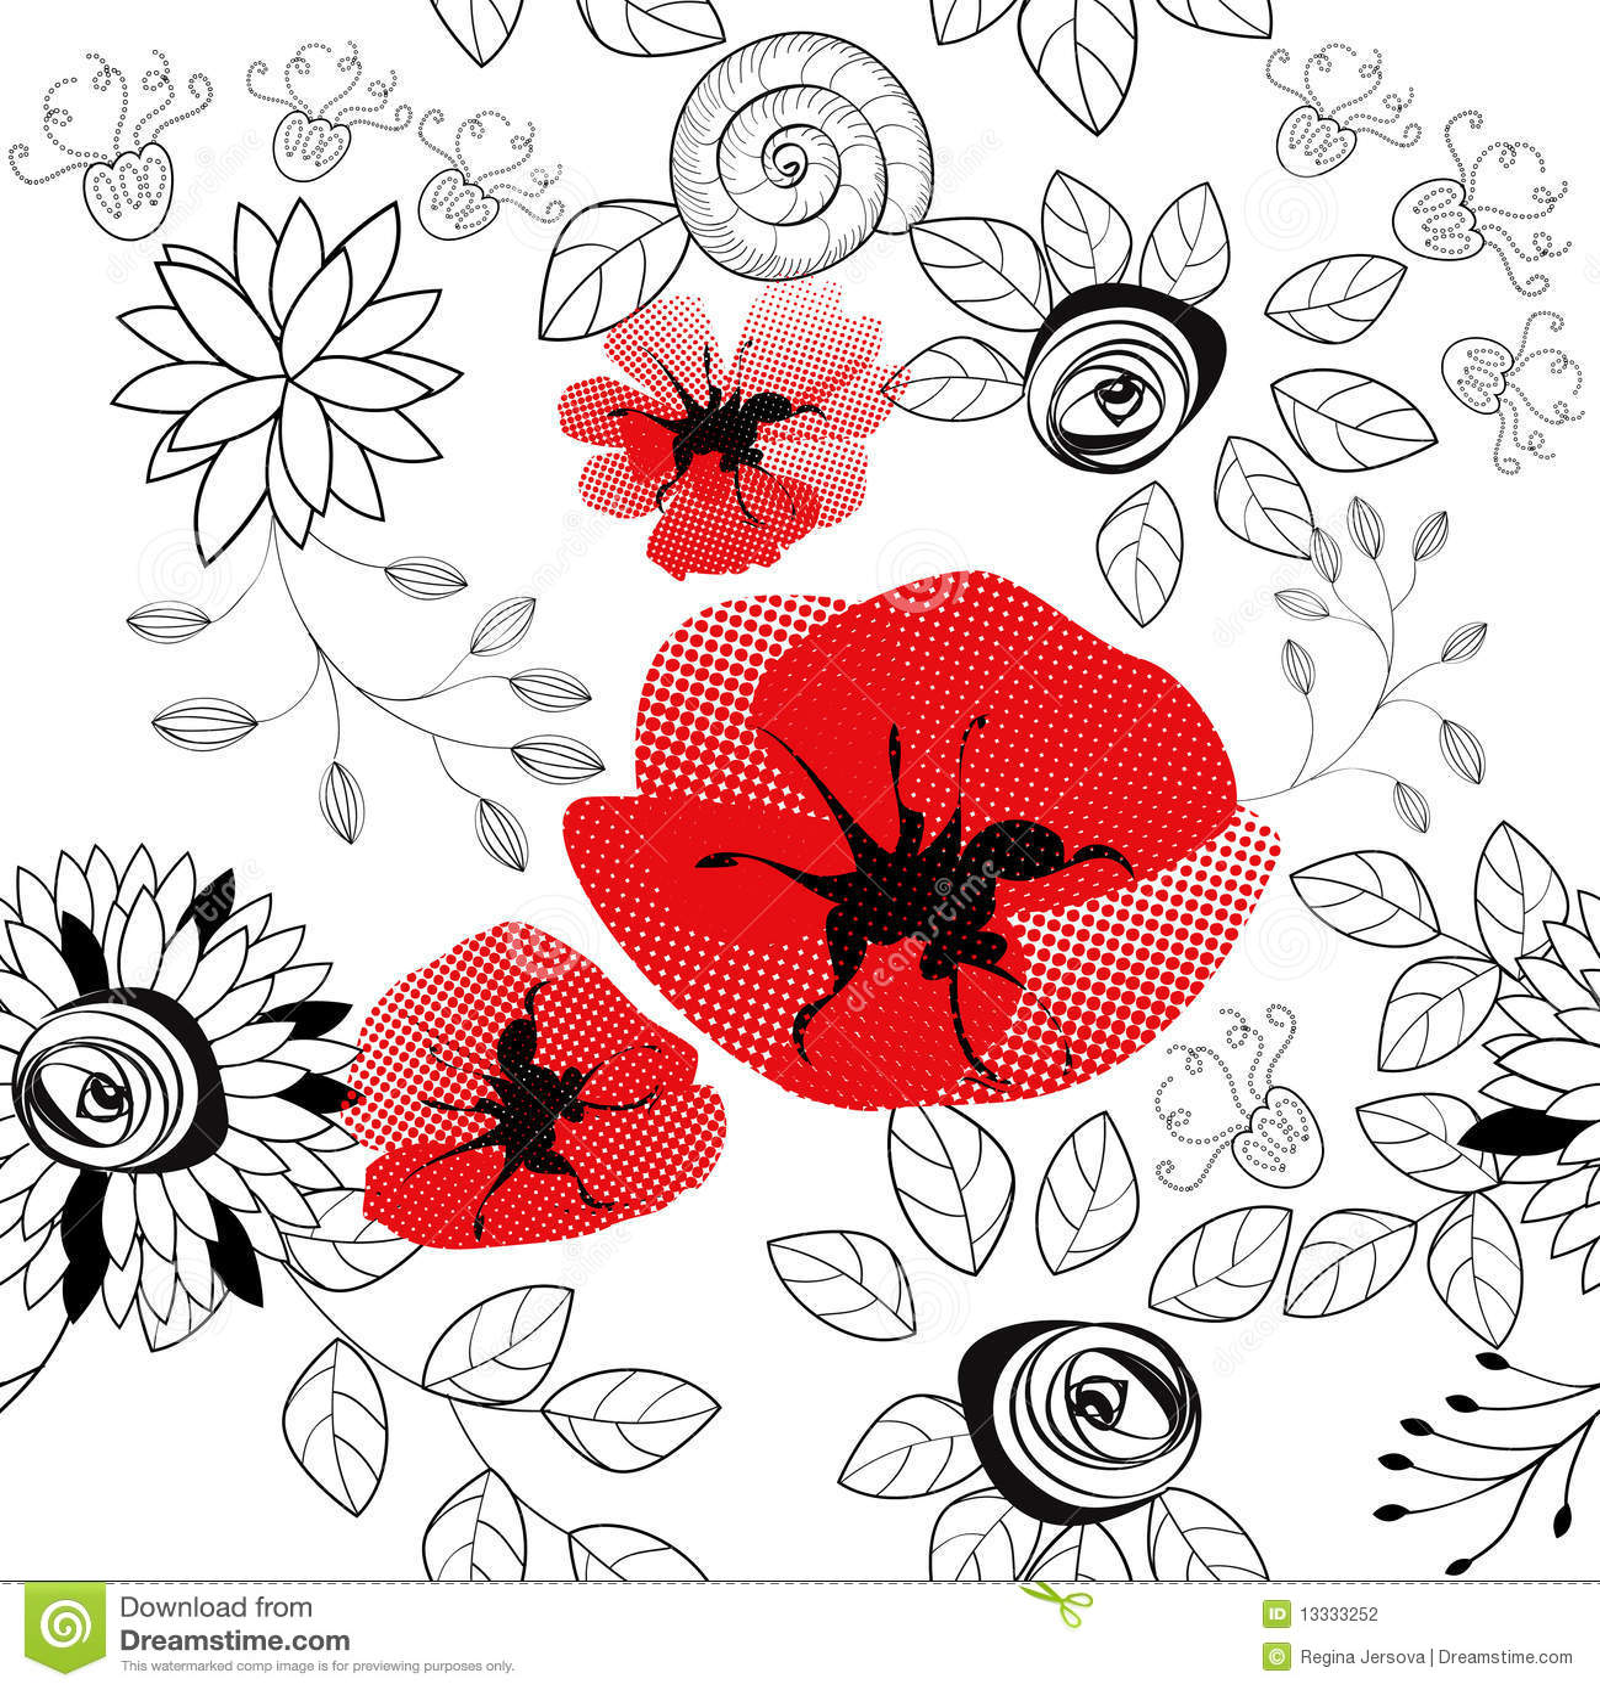 Abstraktes nahtloses mit Blumenmuster